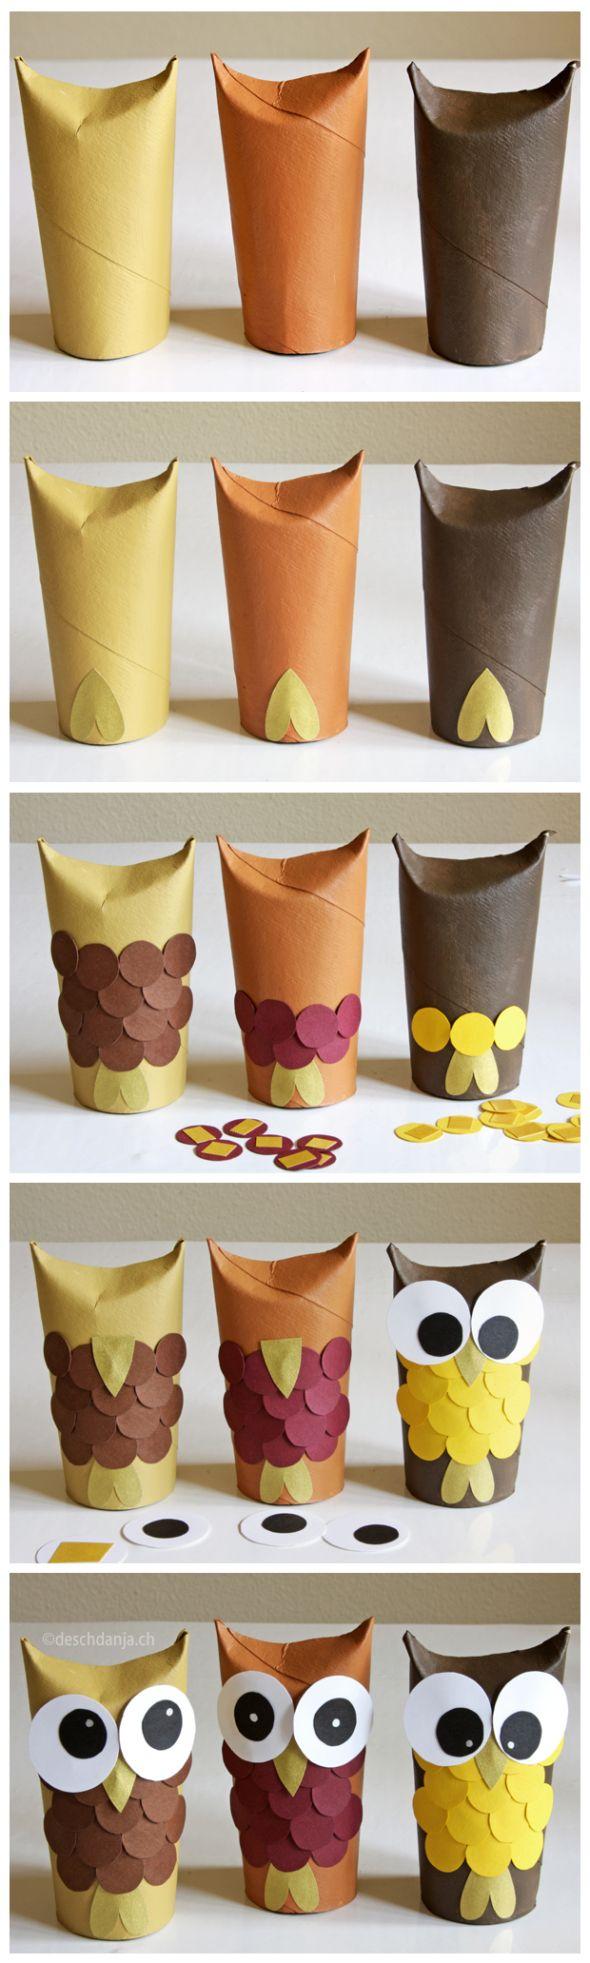 C mo hacer b hos con tubos de cart n de papel higi nico - Manualidades con papel craft ...